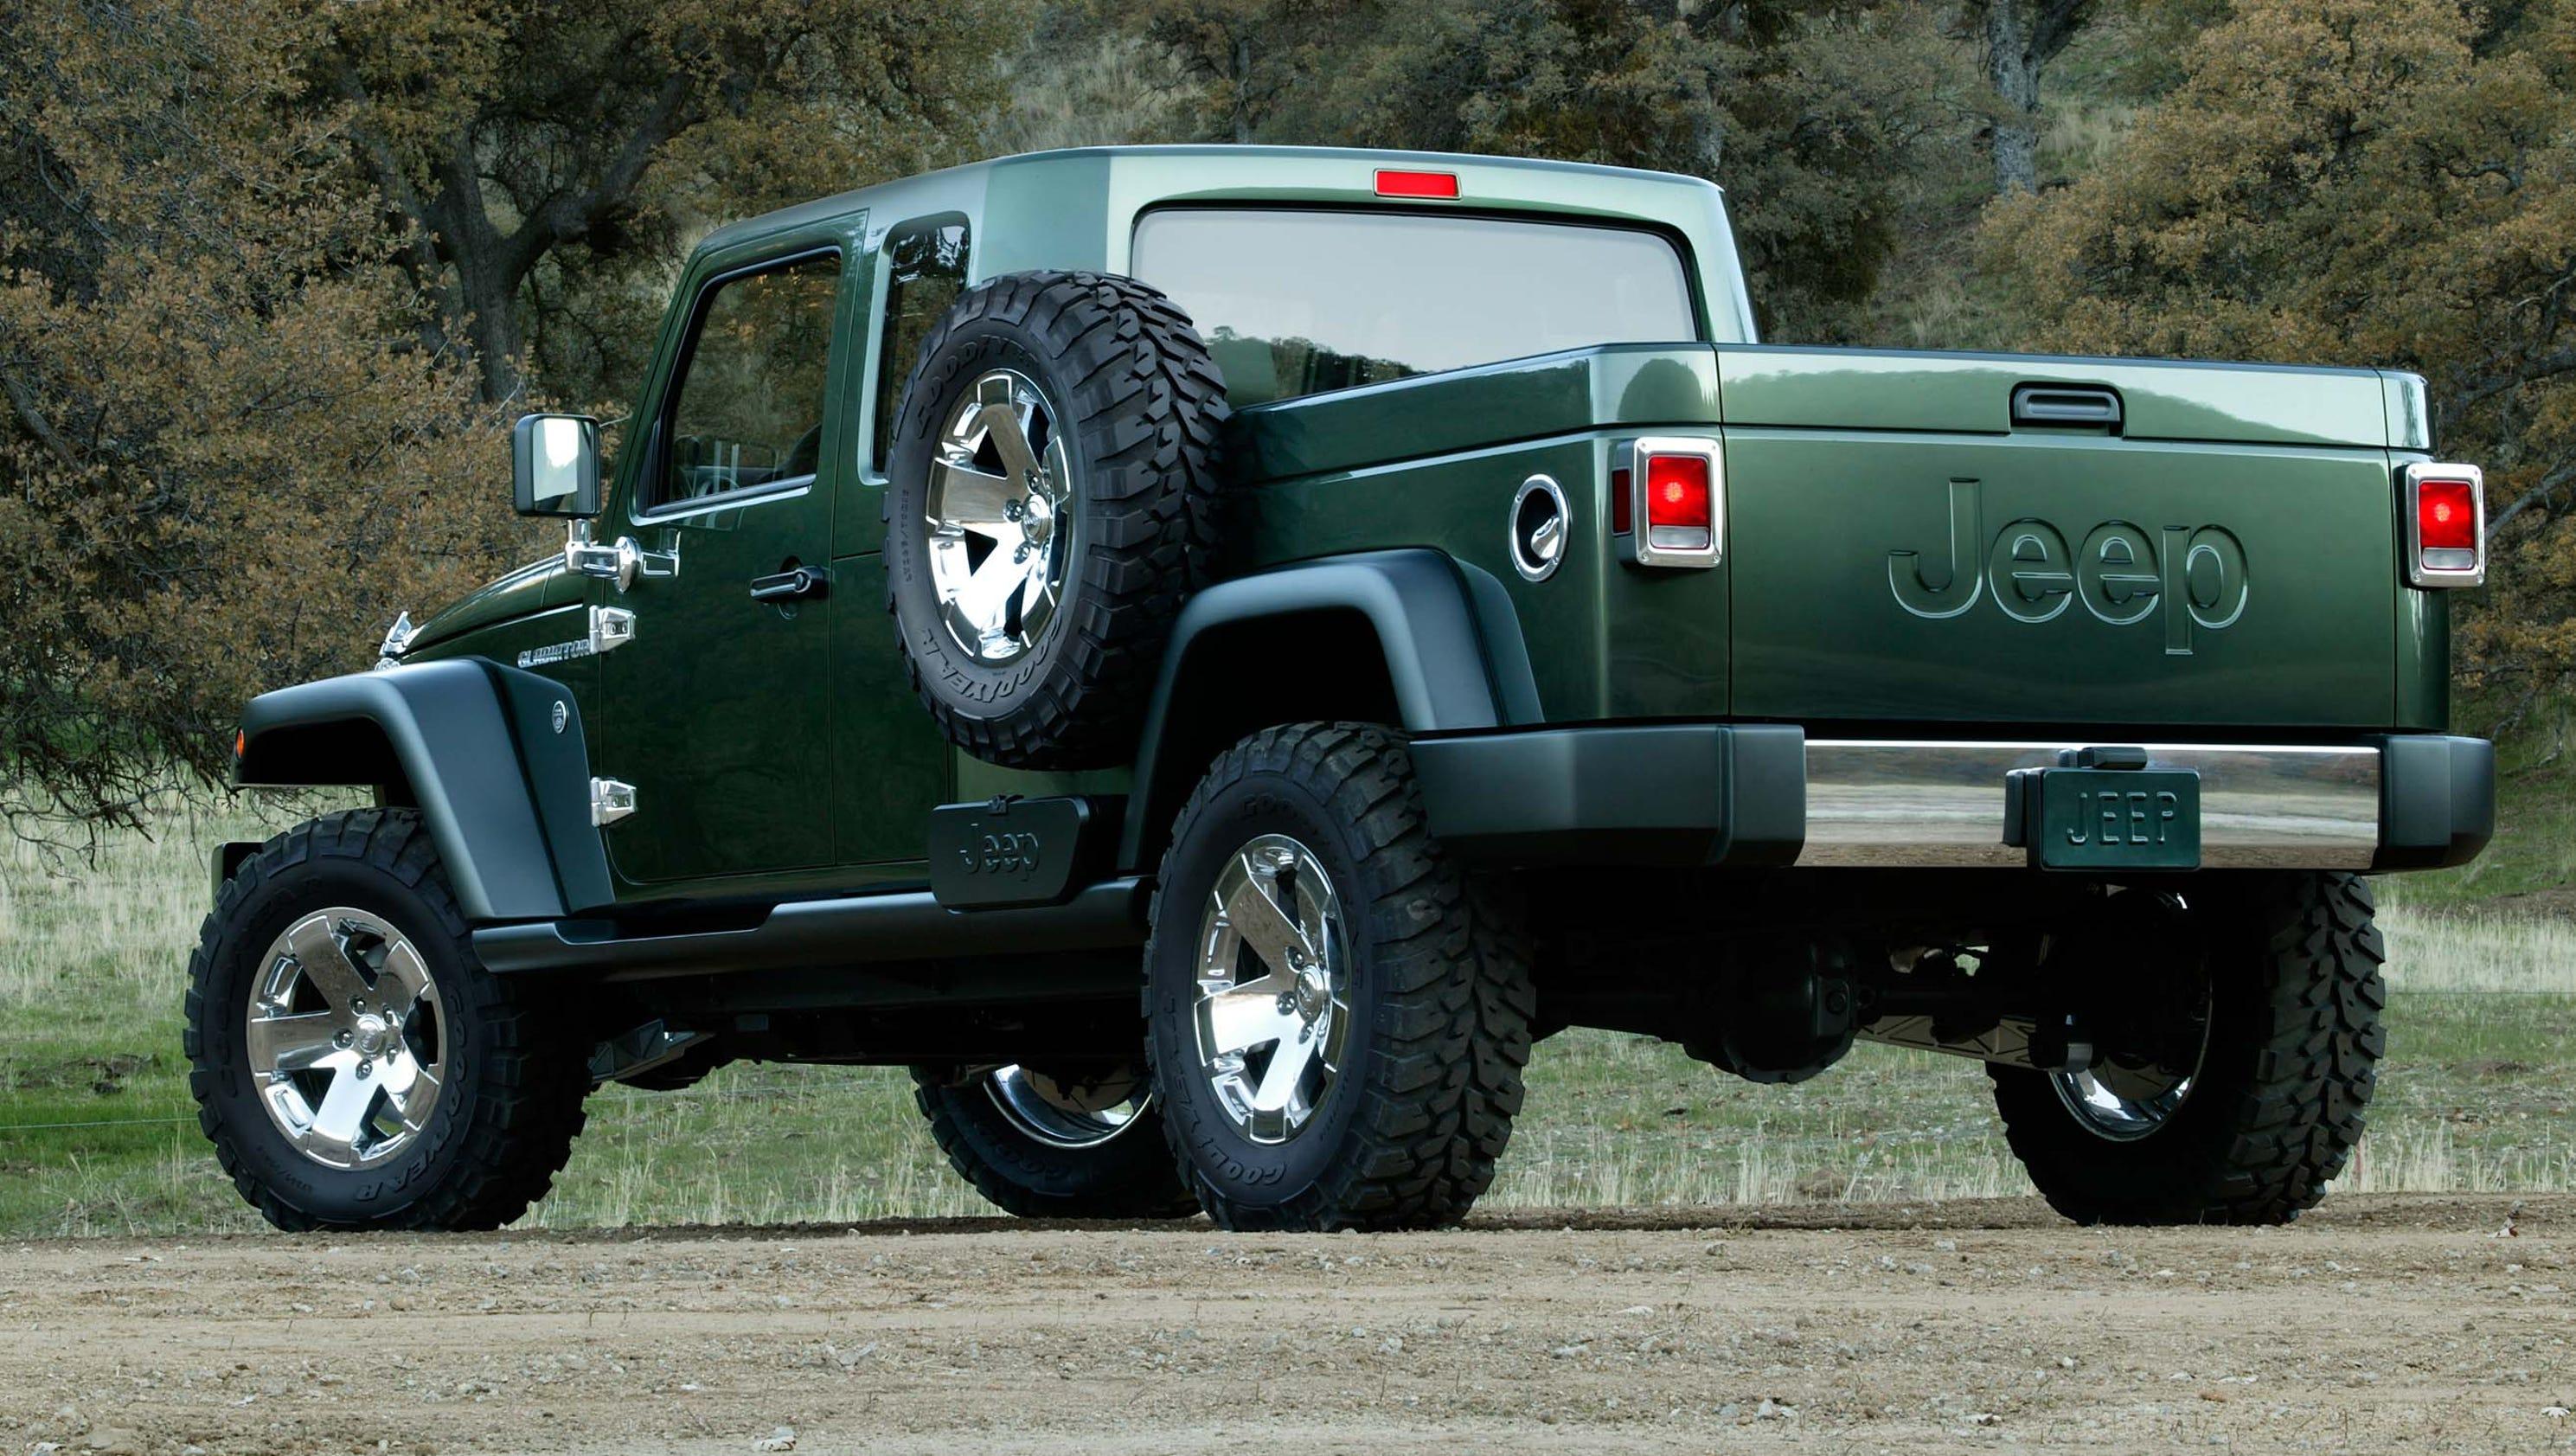 concepts hint at look of jeep wrangler pickup. Black Bedroom Furniture Sets. Home Design Ideas